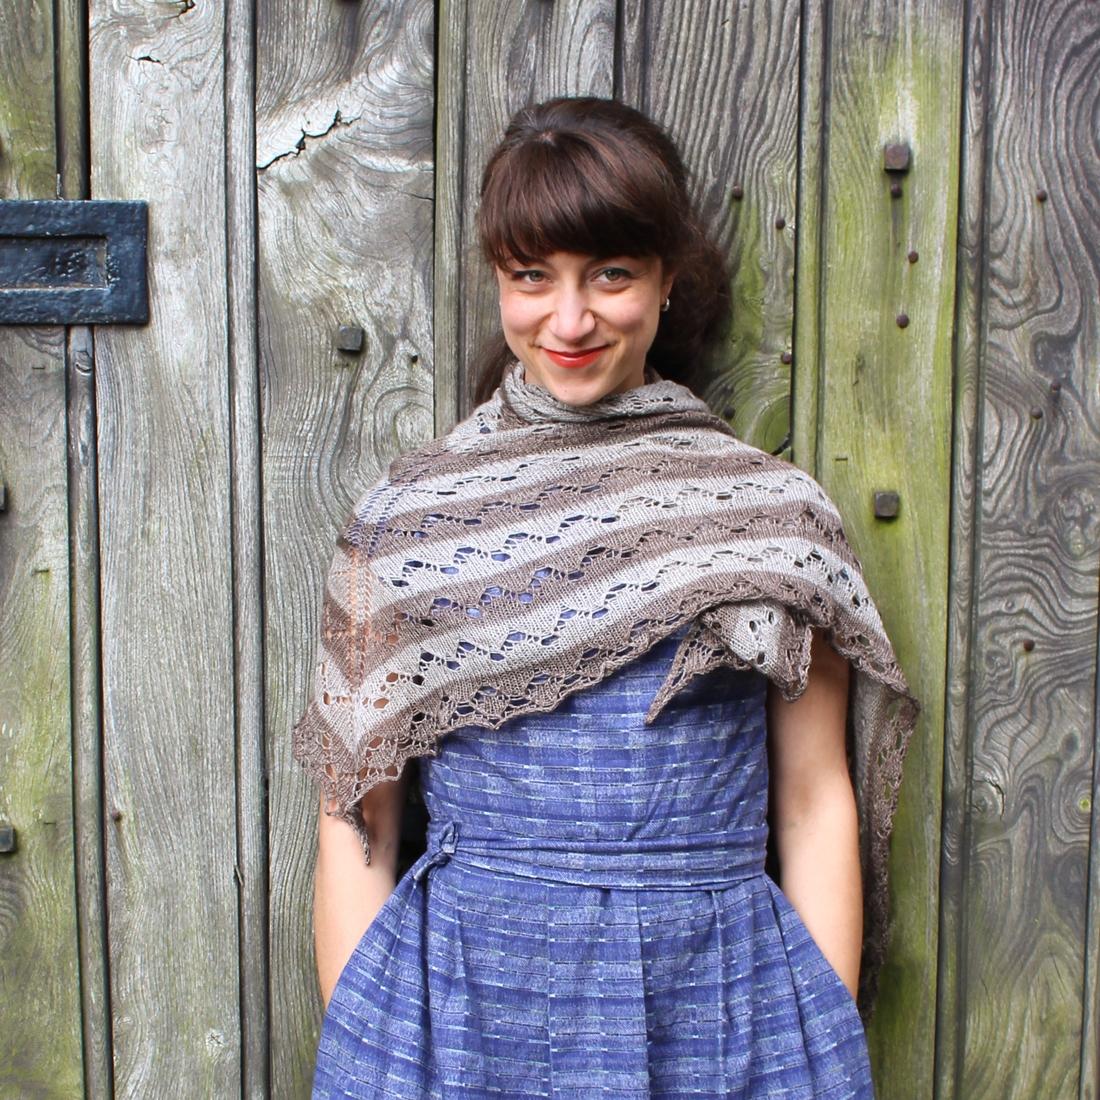 Angelus Novus Lace shawl by Renée Callahan.jpg